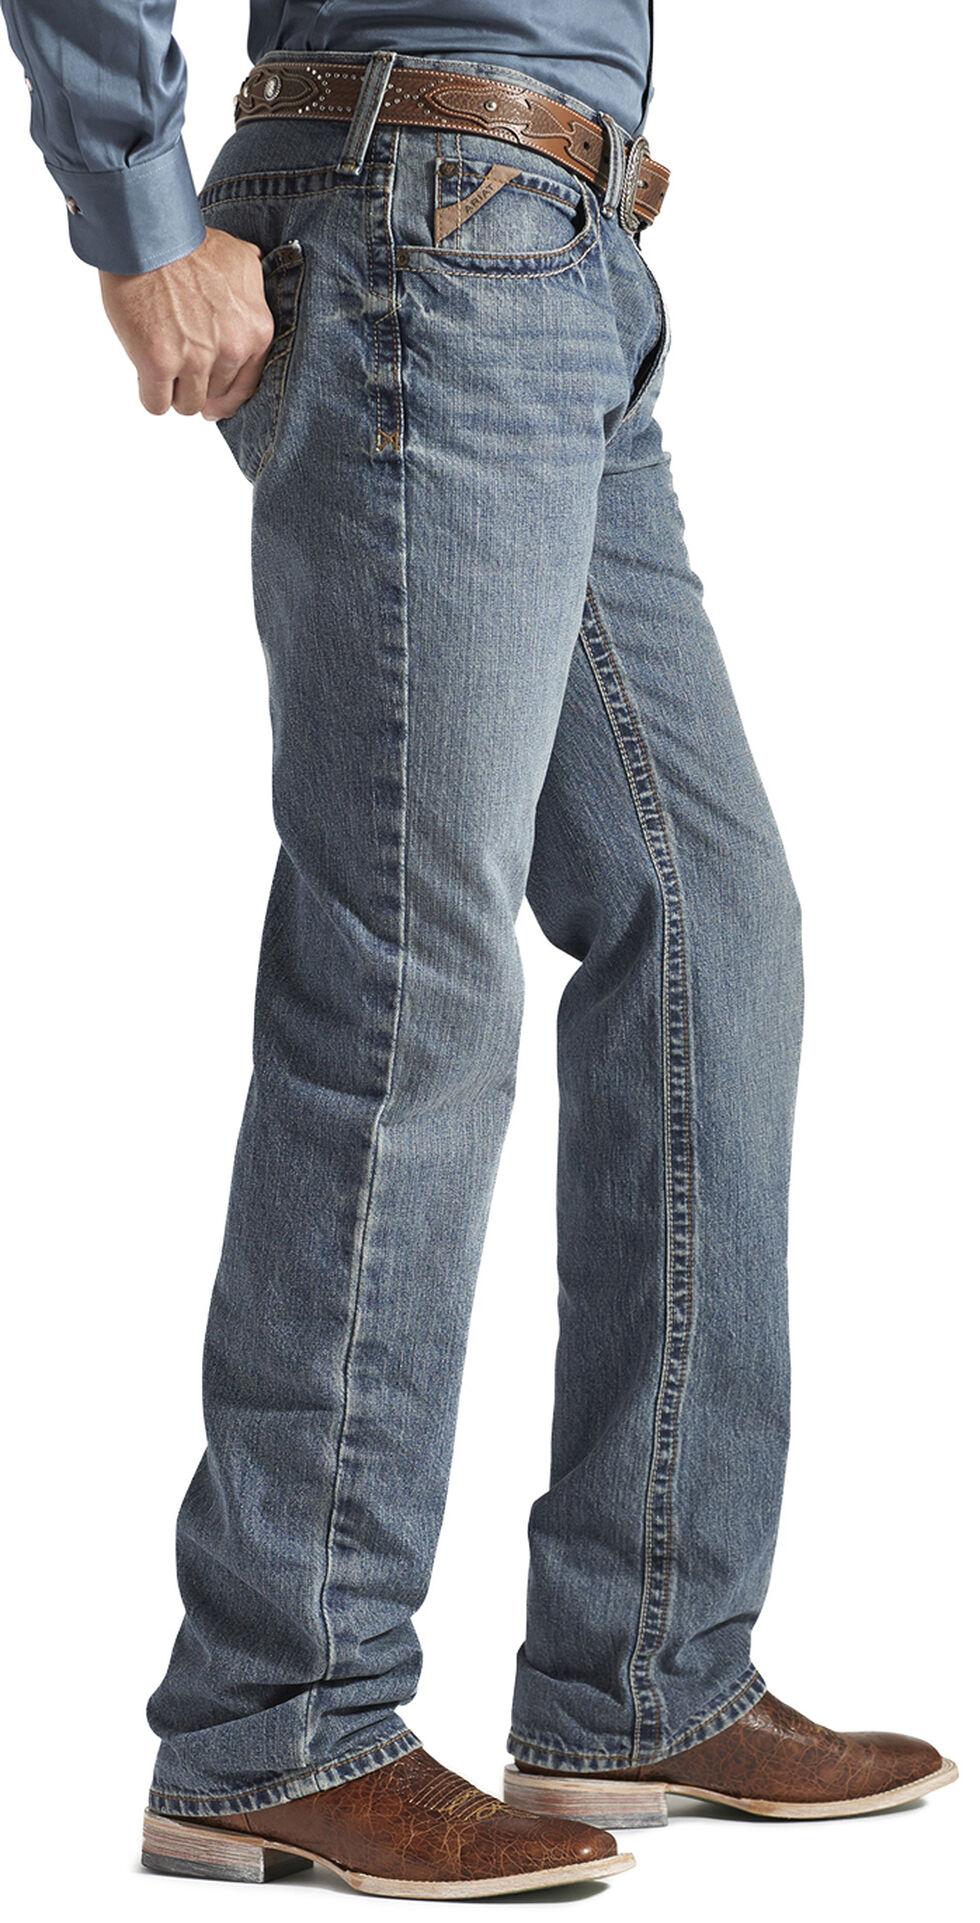 Ariat Denim Jeans - M2 Smokestack Relaxed Fit, Denim, hi-res